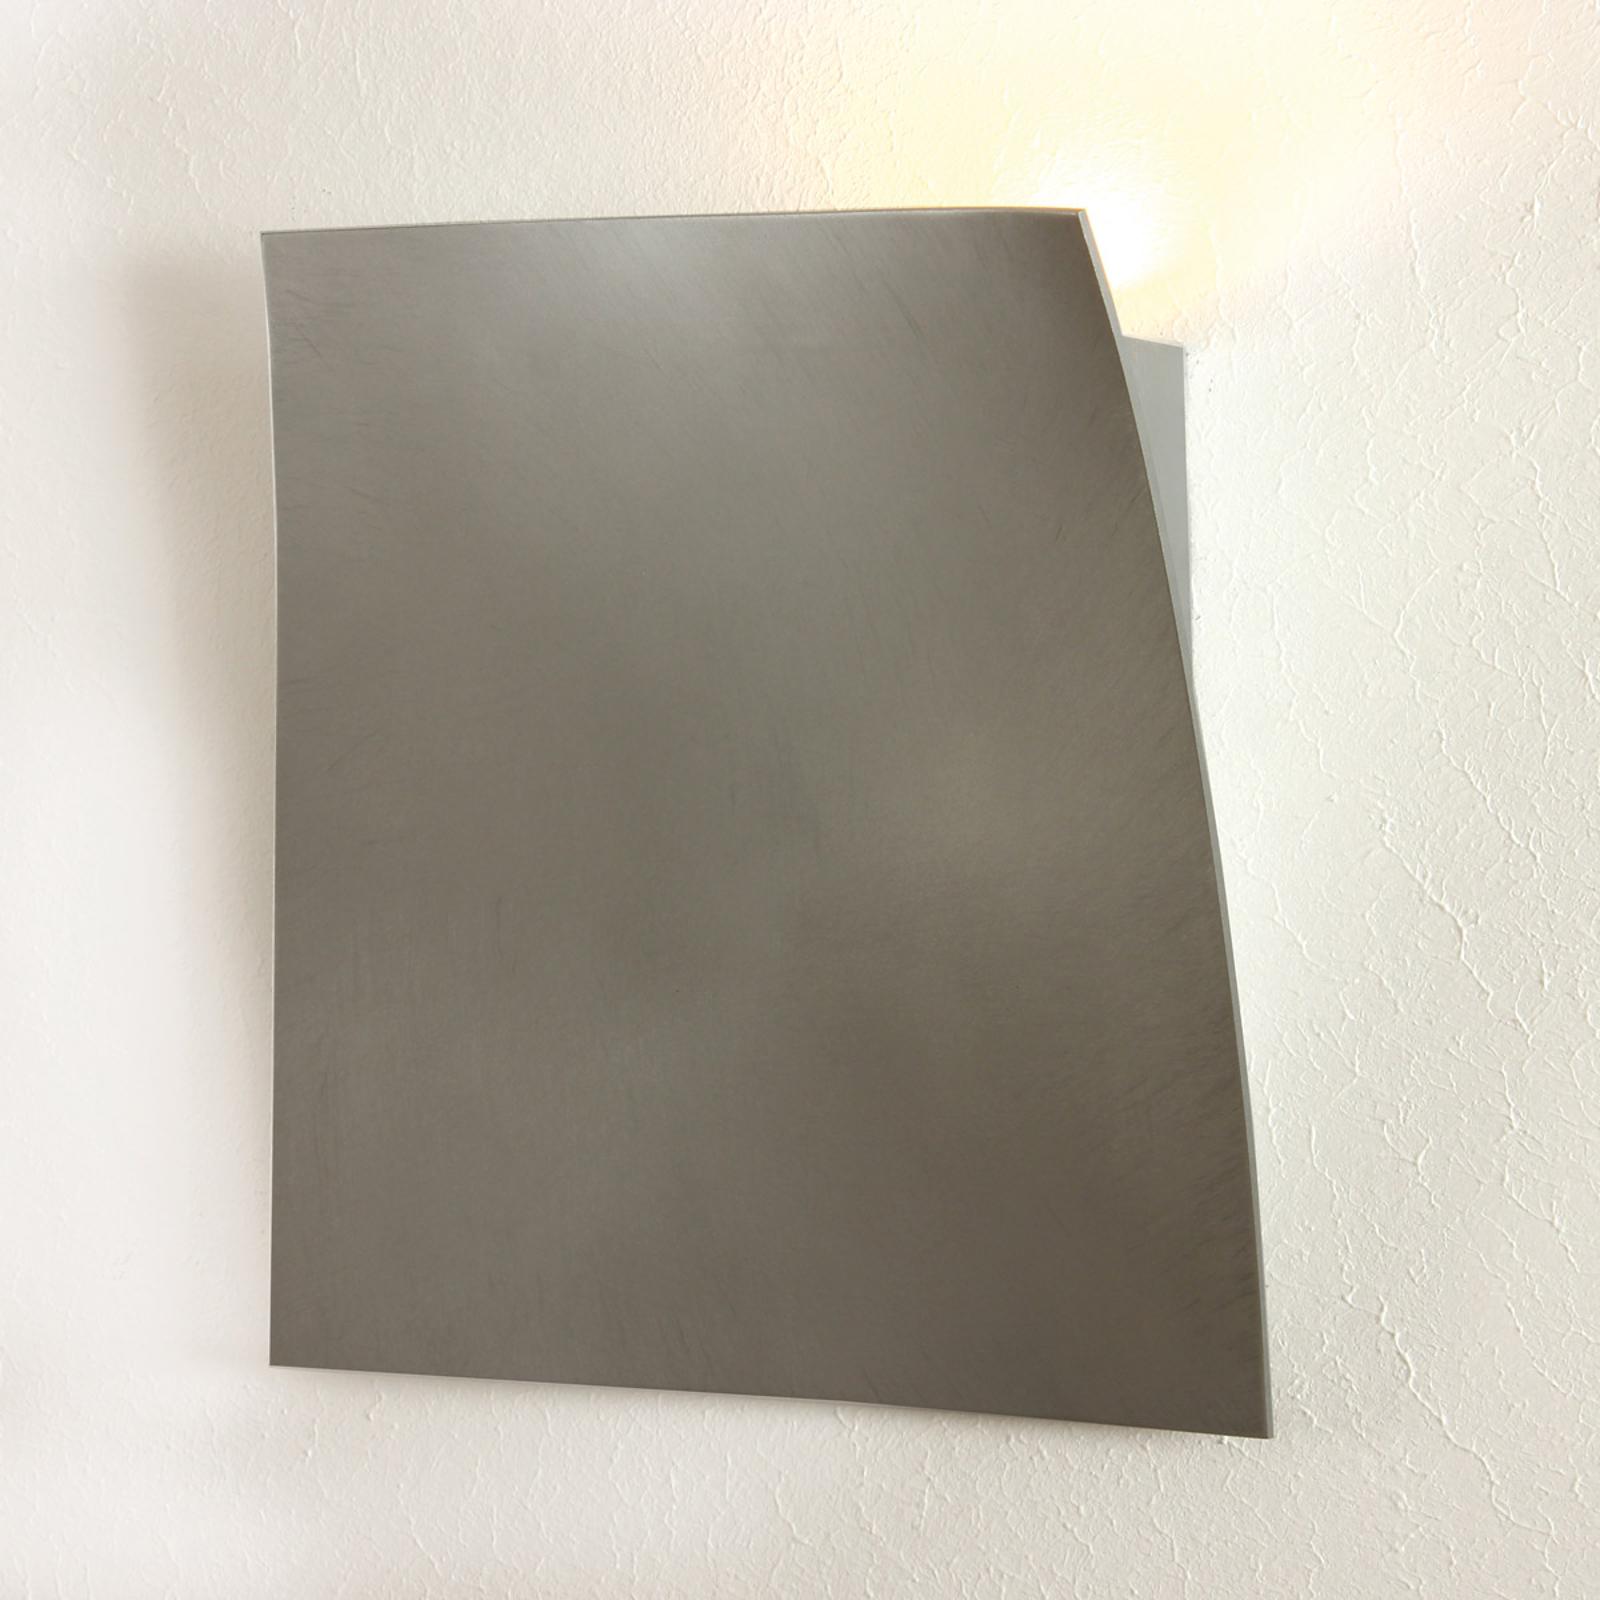 Lampa ścienna LED Gap ze szlifowanego aluminium